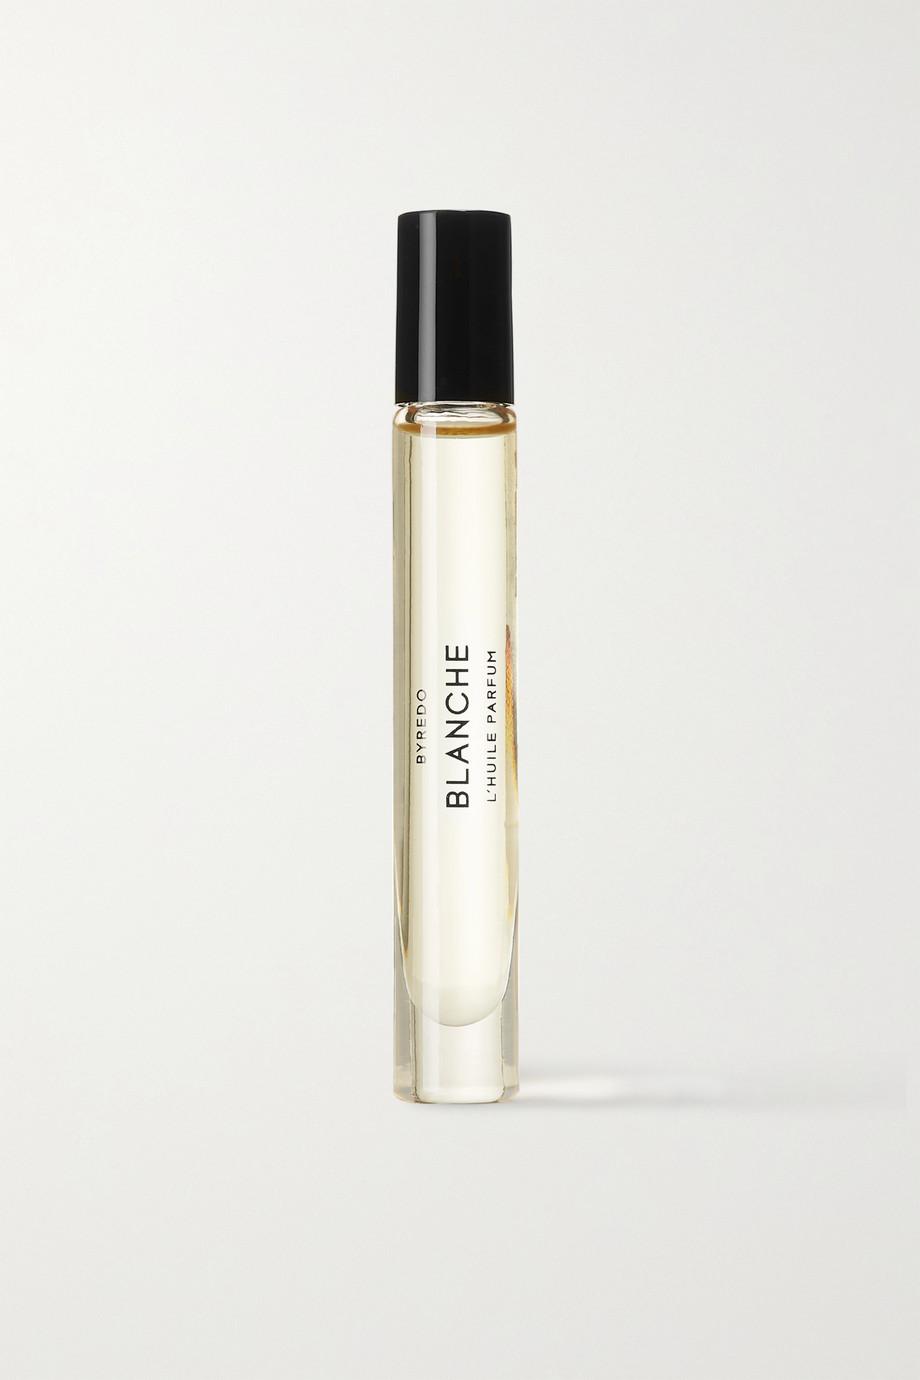 Byredo Perfumed Oil Roll-On - Blanche, 7.5ml